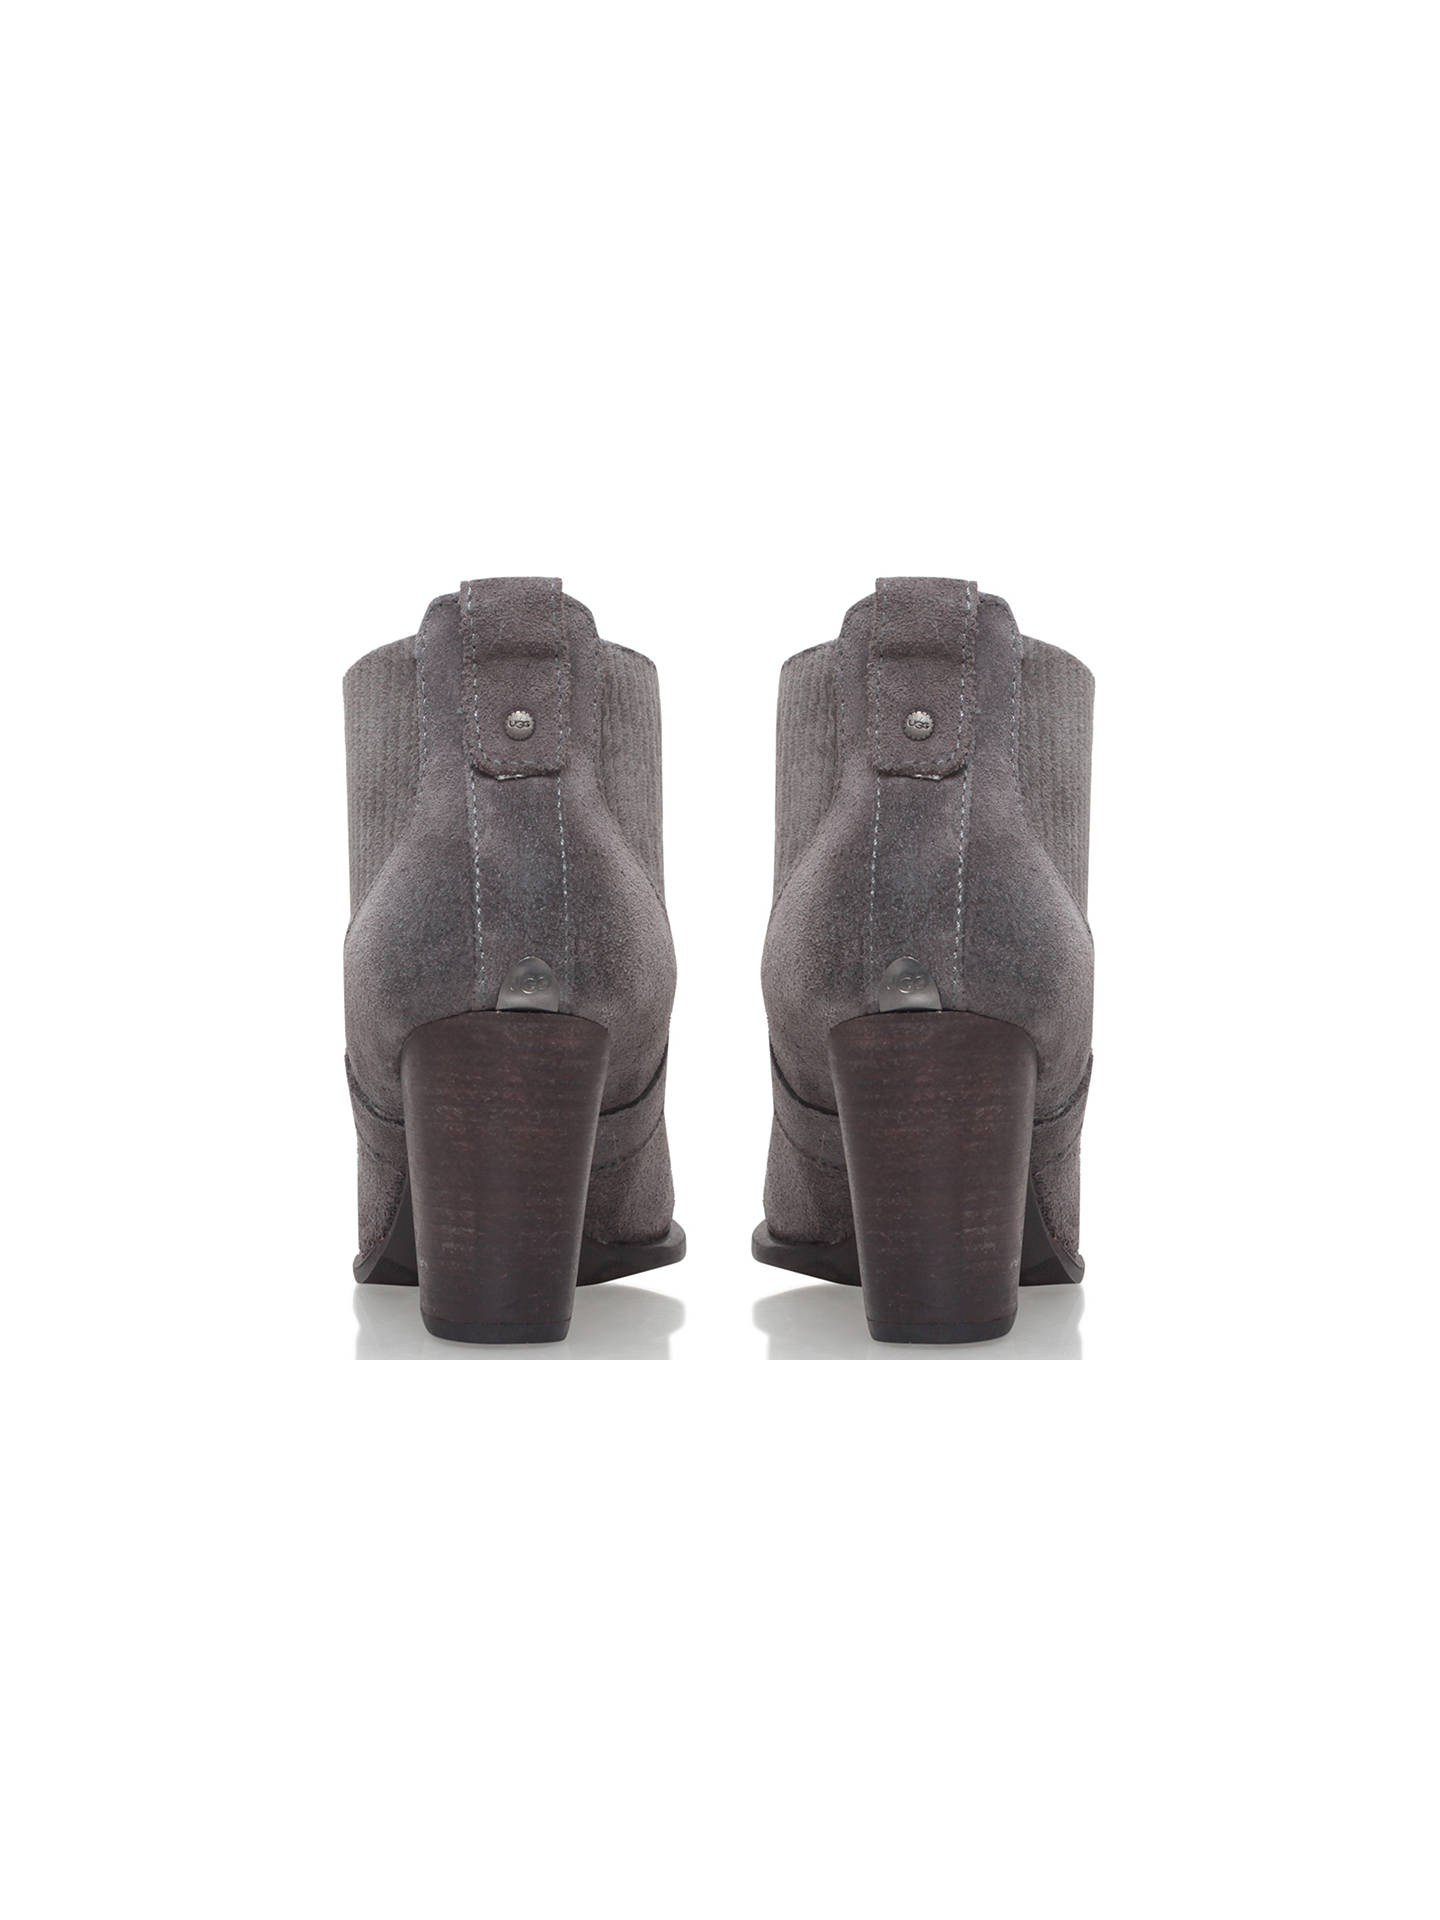 27ac2721fcb UGG Cobie II Block Heel Ankle Boots, Grey Suede at John Lewis & Partners